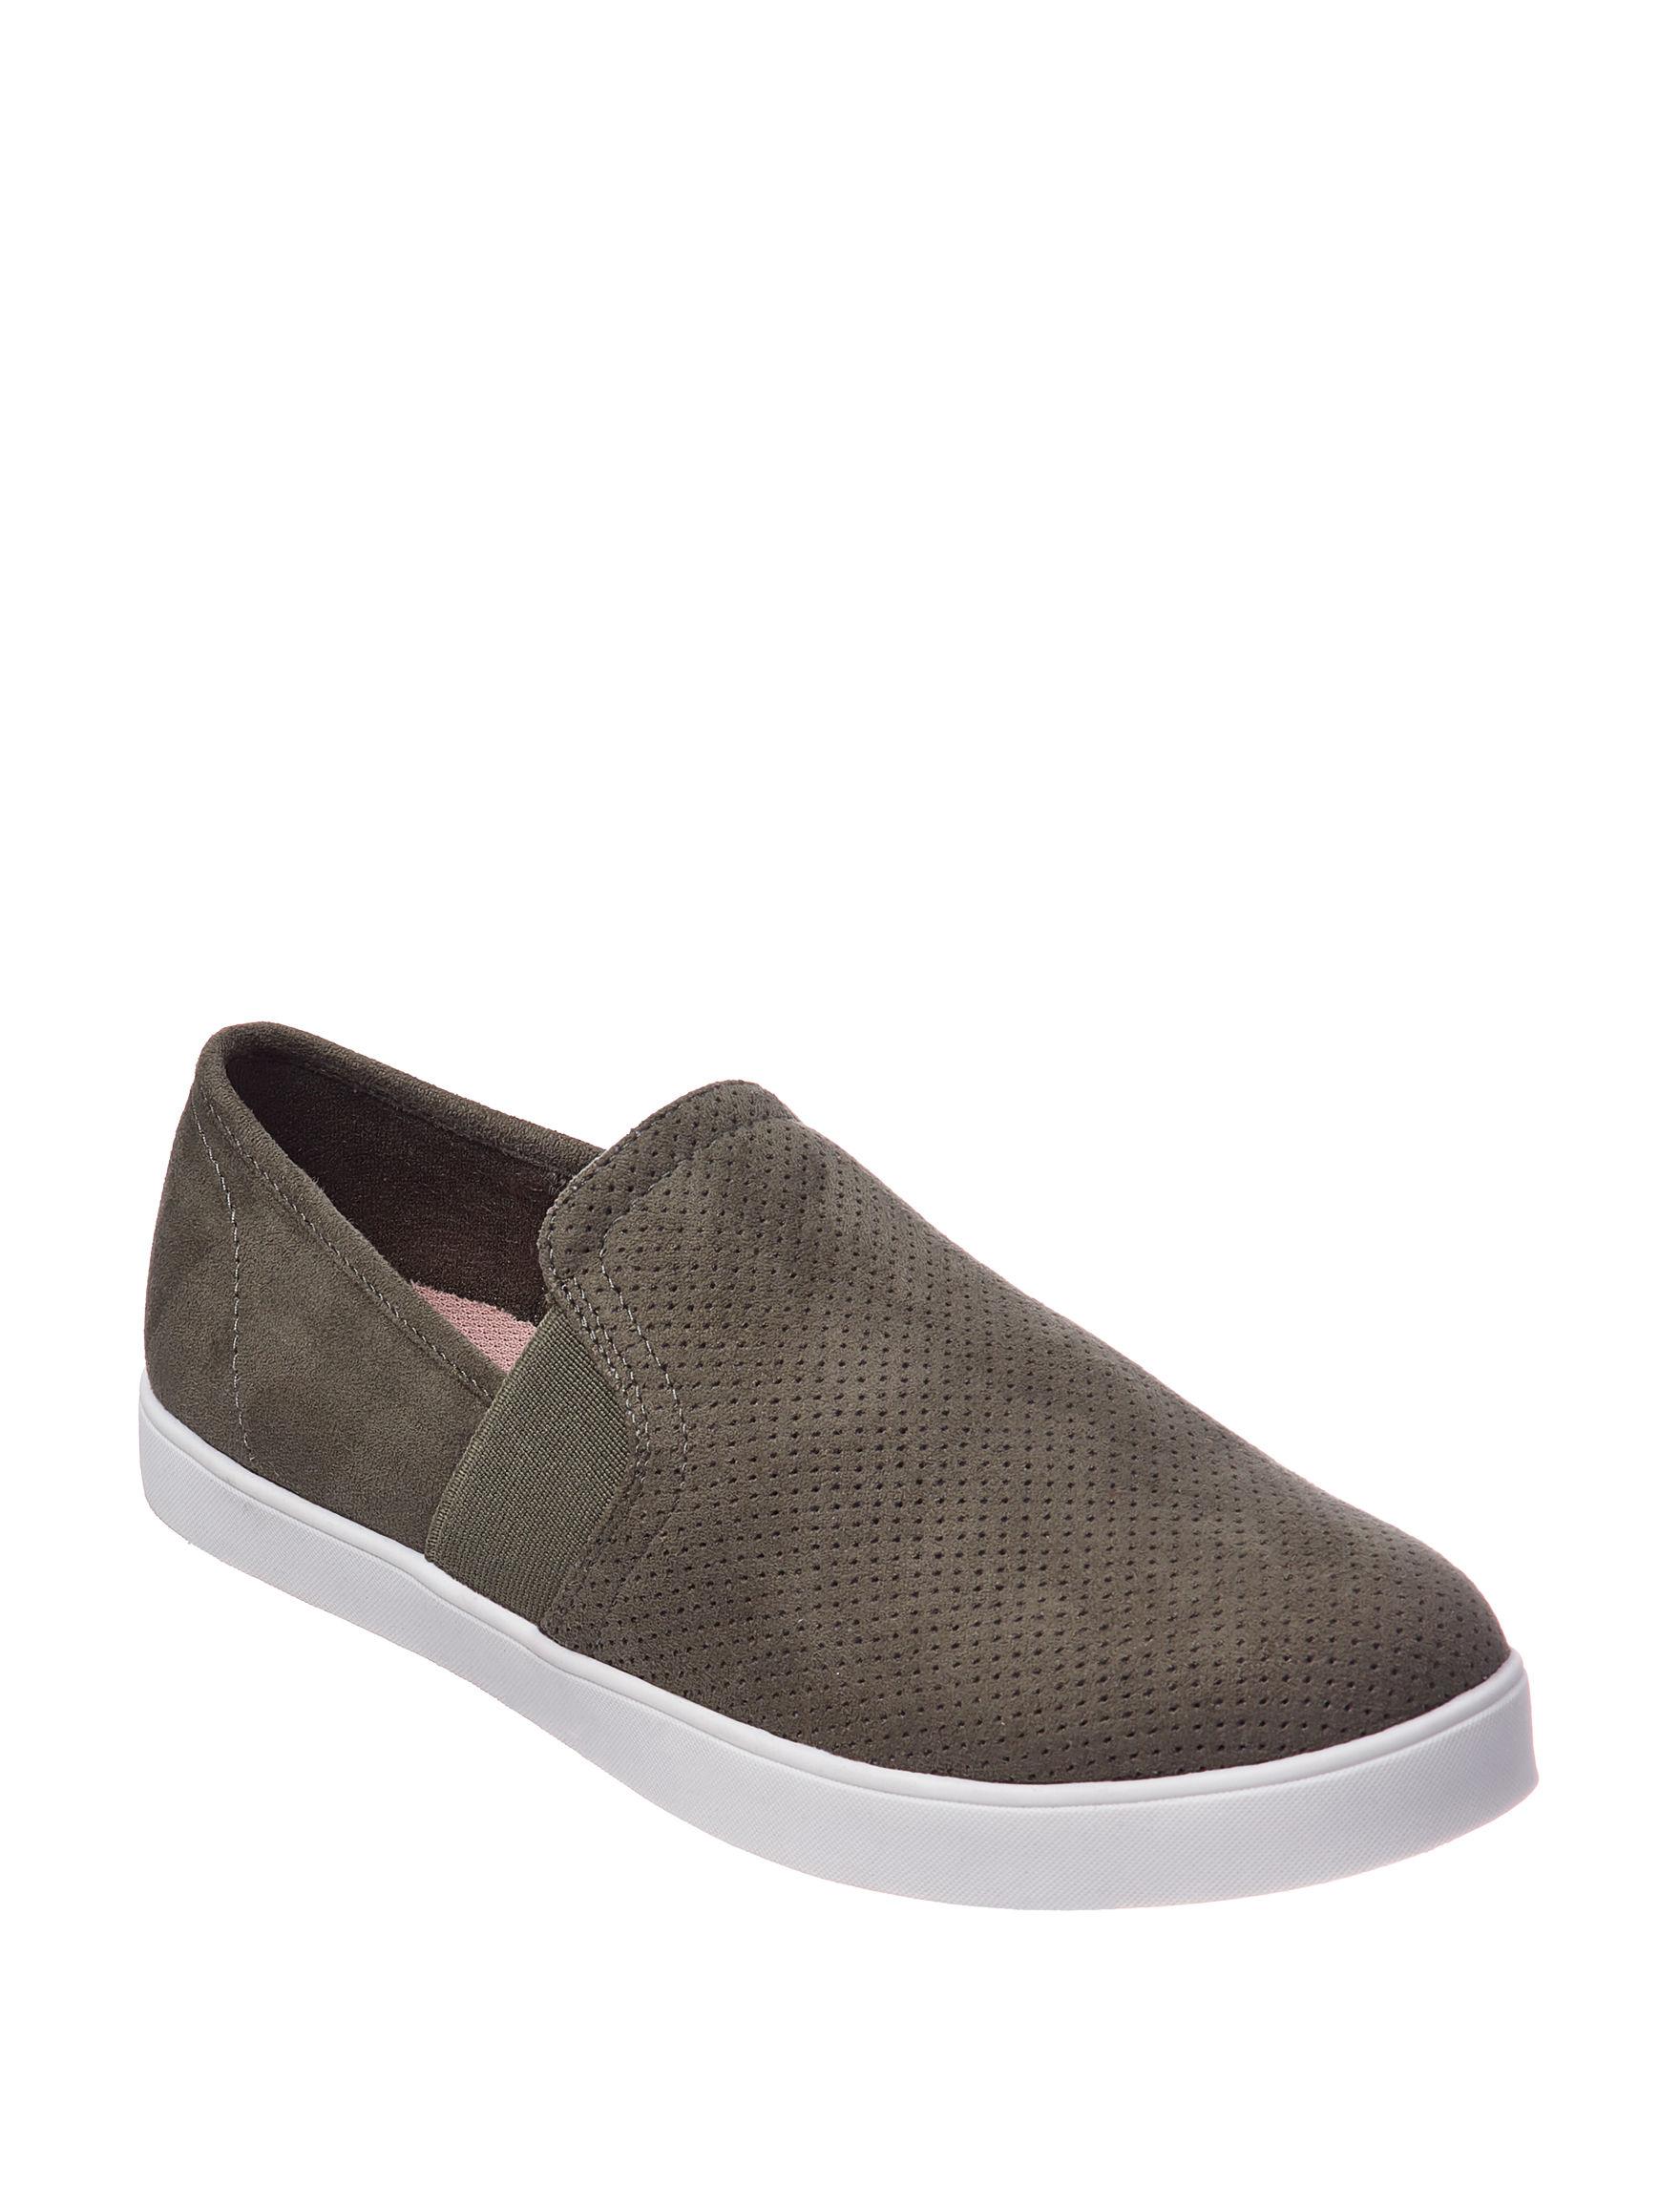 Dr. Scholl's Olive Comfort Shoes